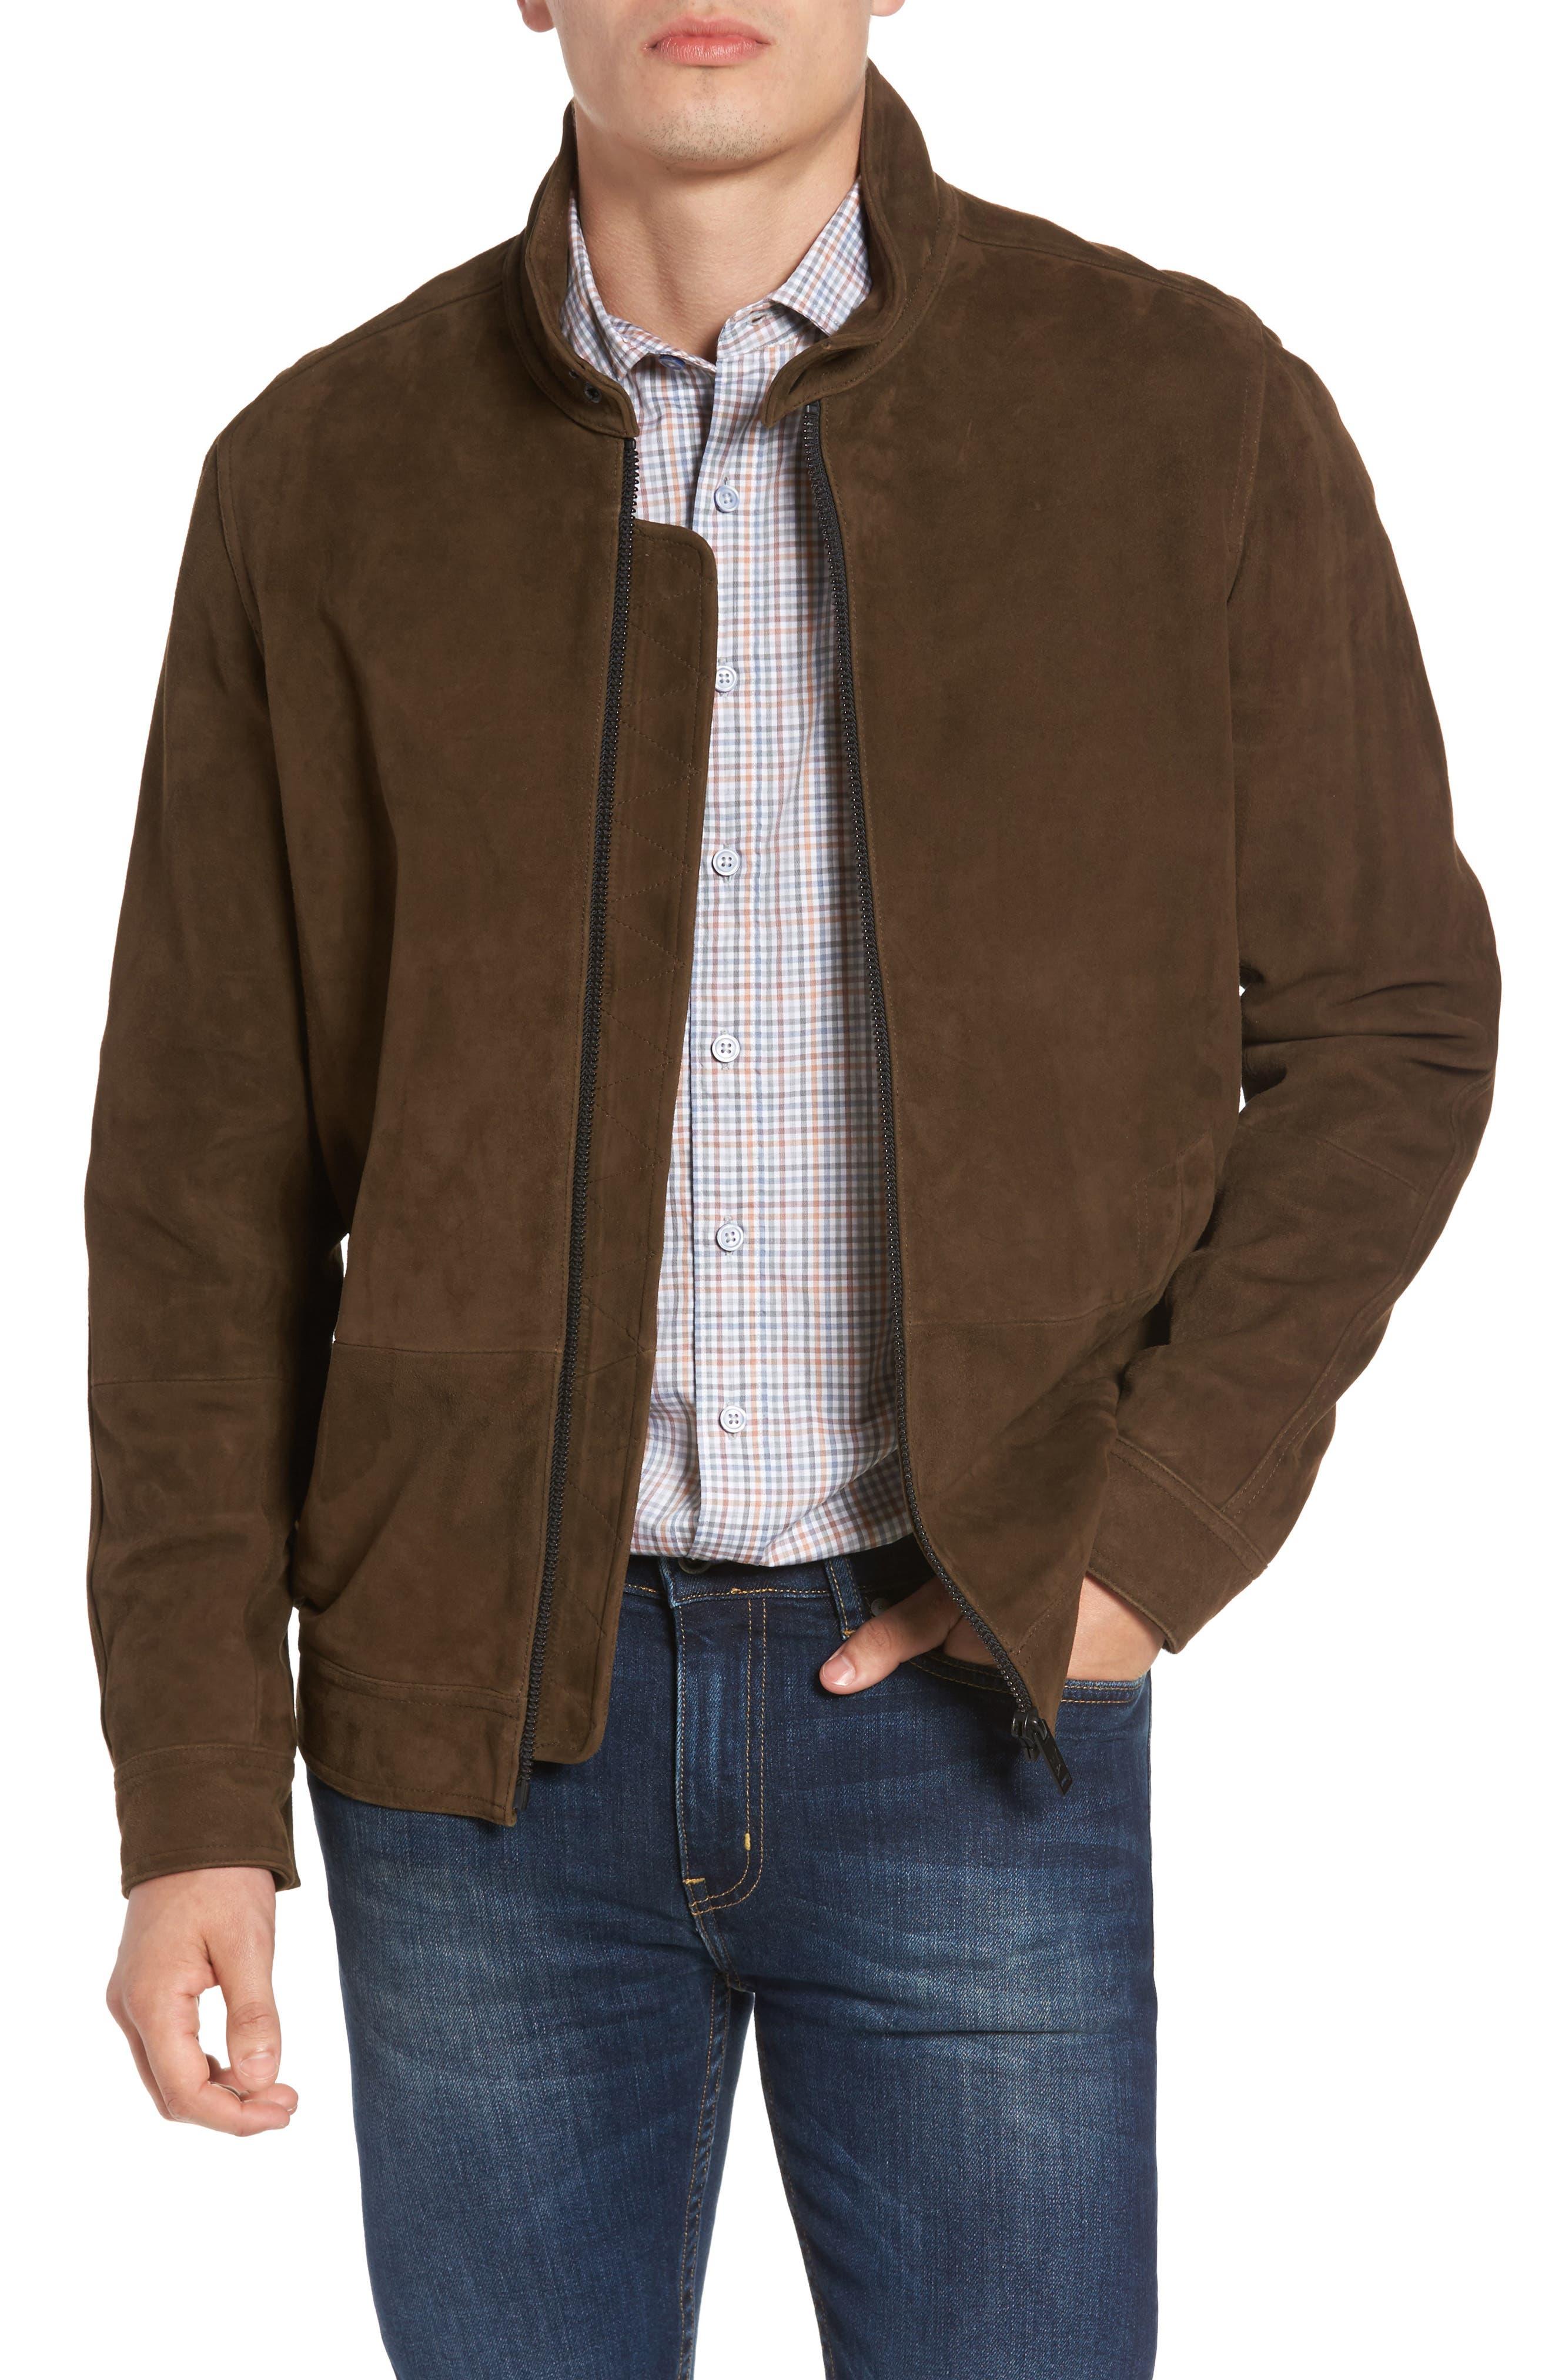 Alternate Image 1 Selected - Rodd & Gunn Avondale Suede Jacket